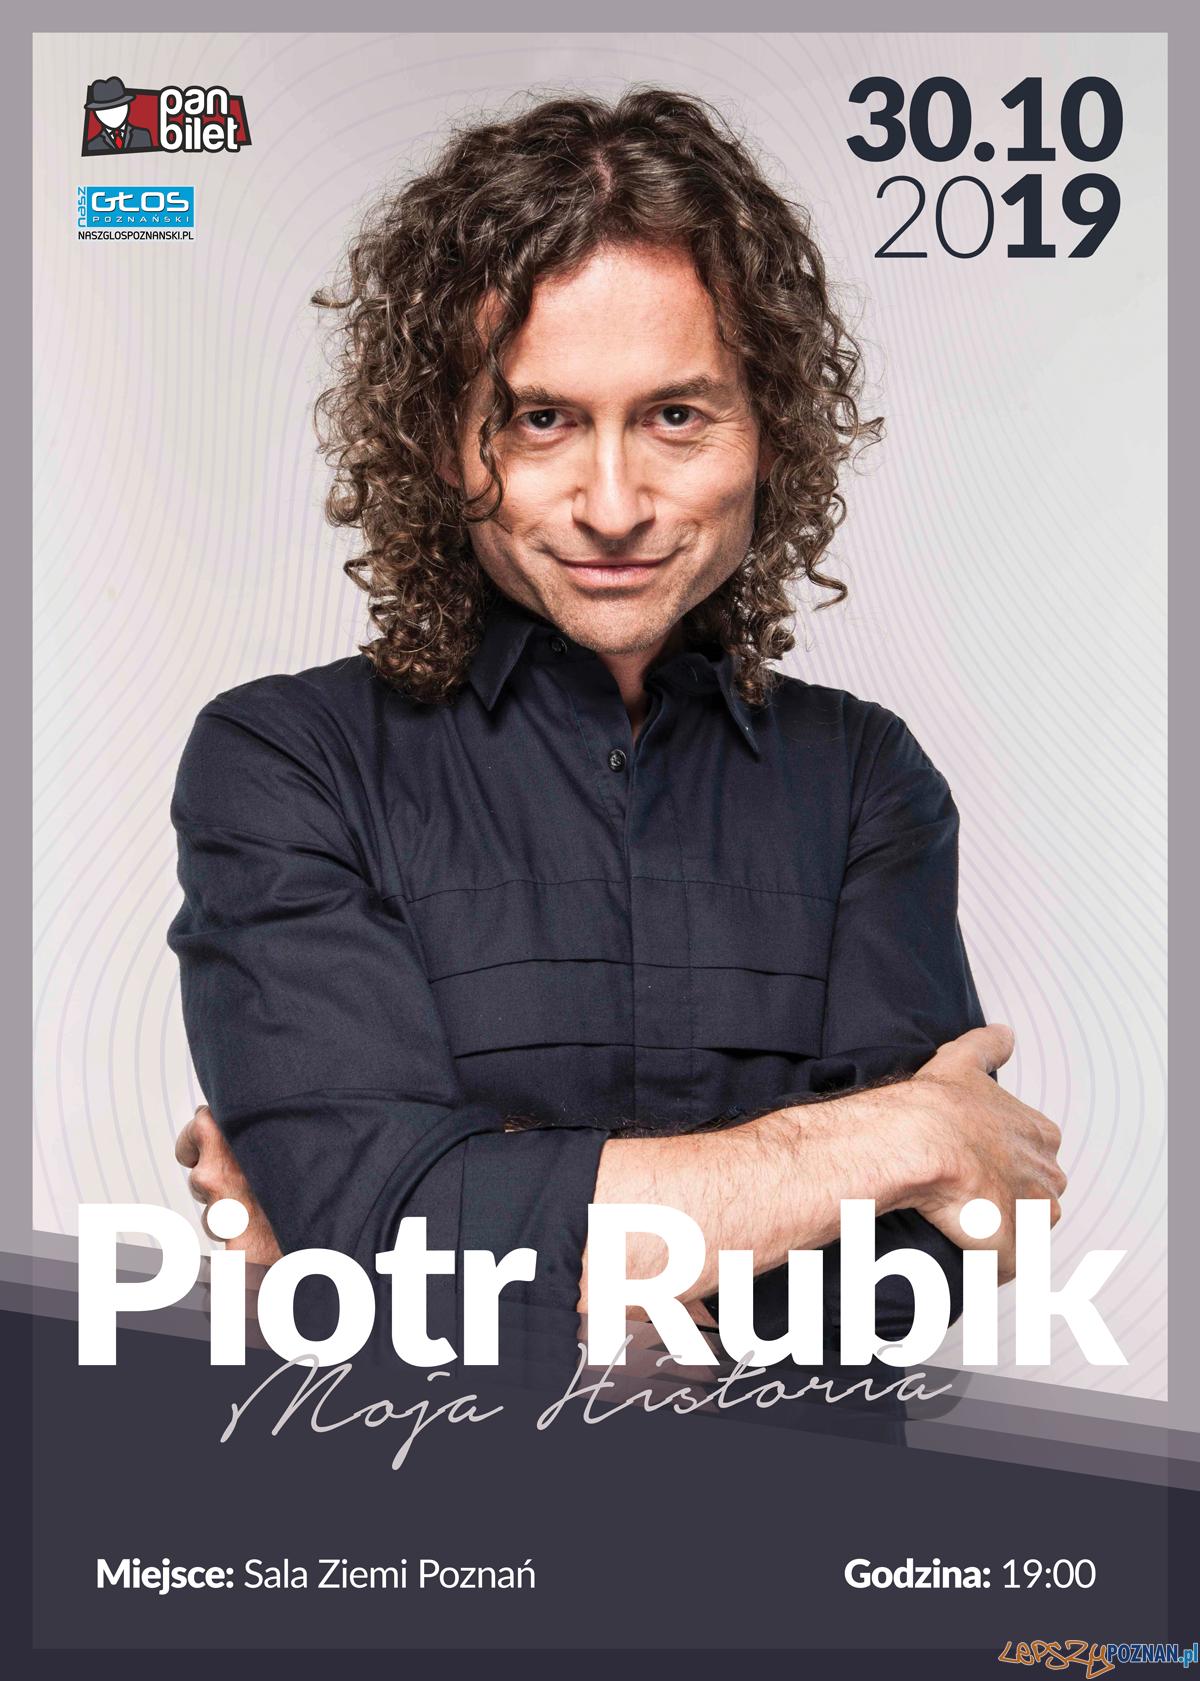 Piotr Rubik - Moja historia  Foto: materiały prasowe